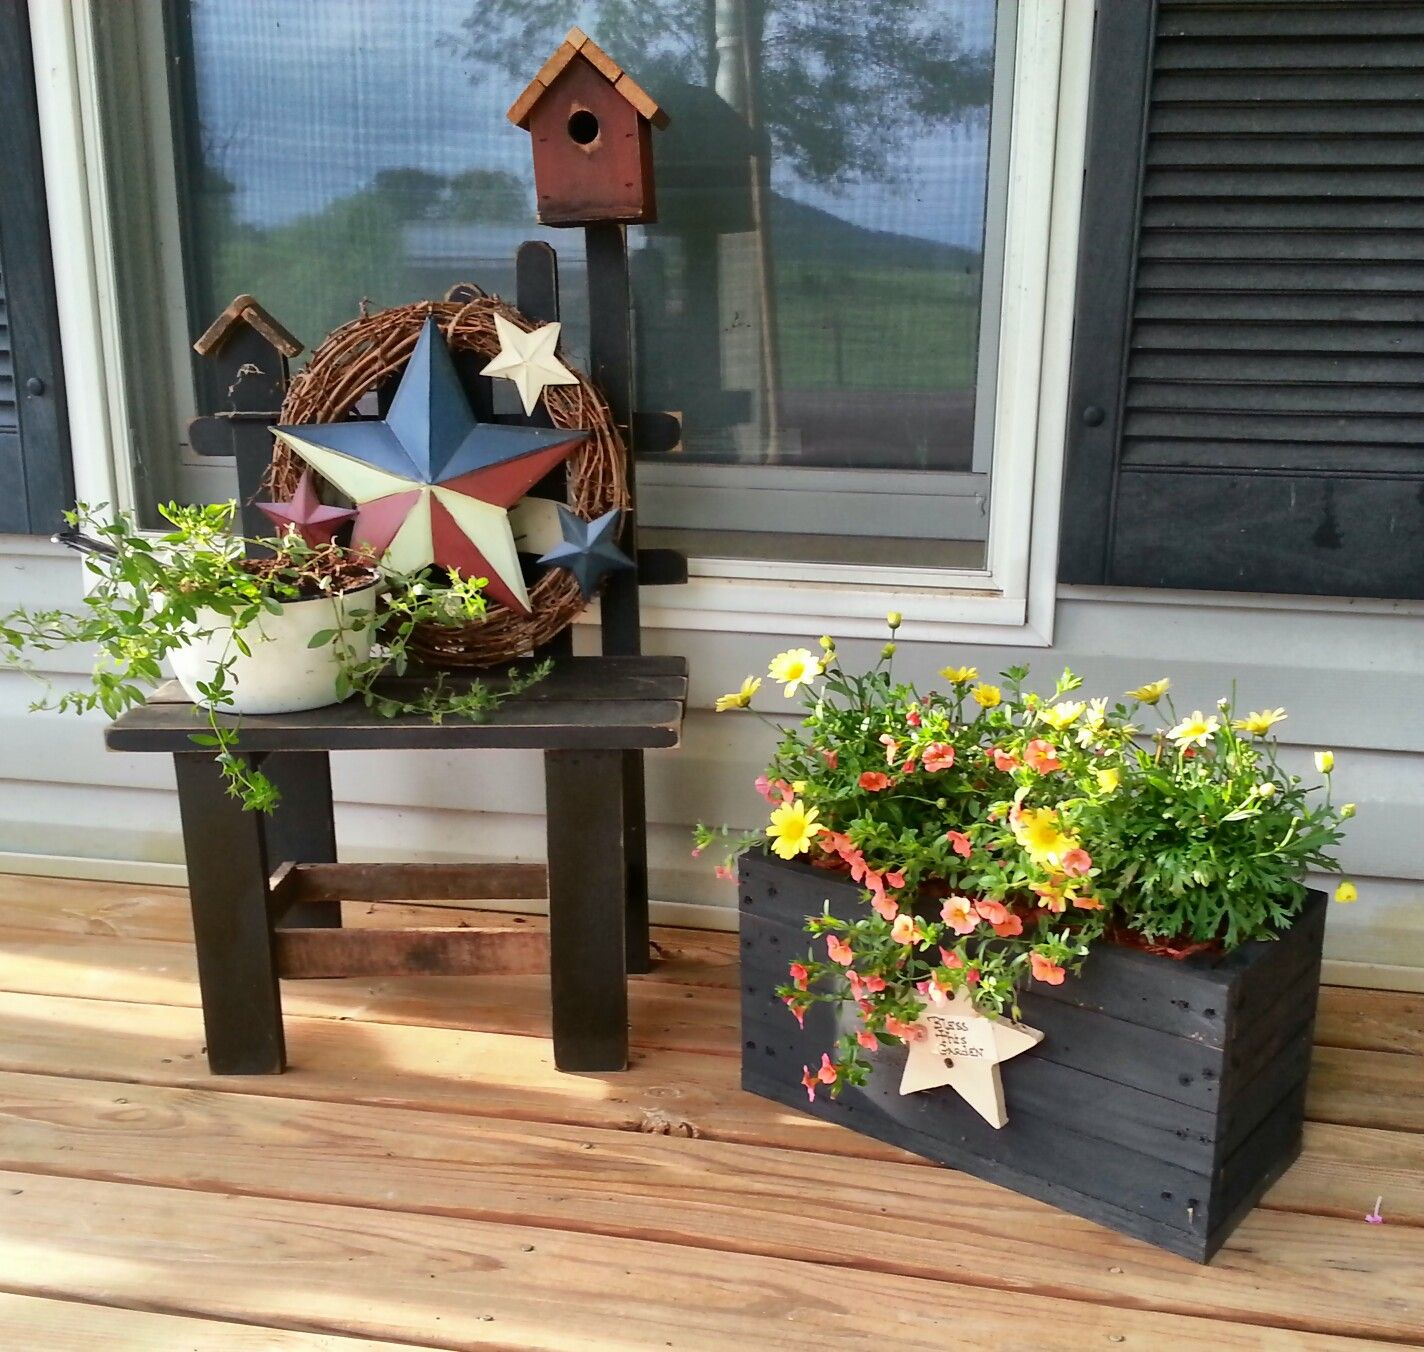 Back Porch Design Ideas: Spring Porch Decorating Ideas